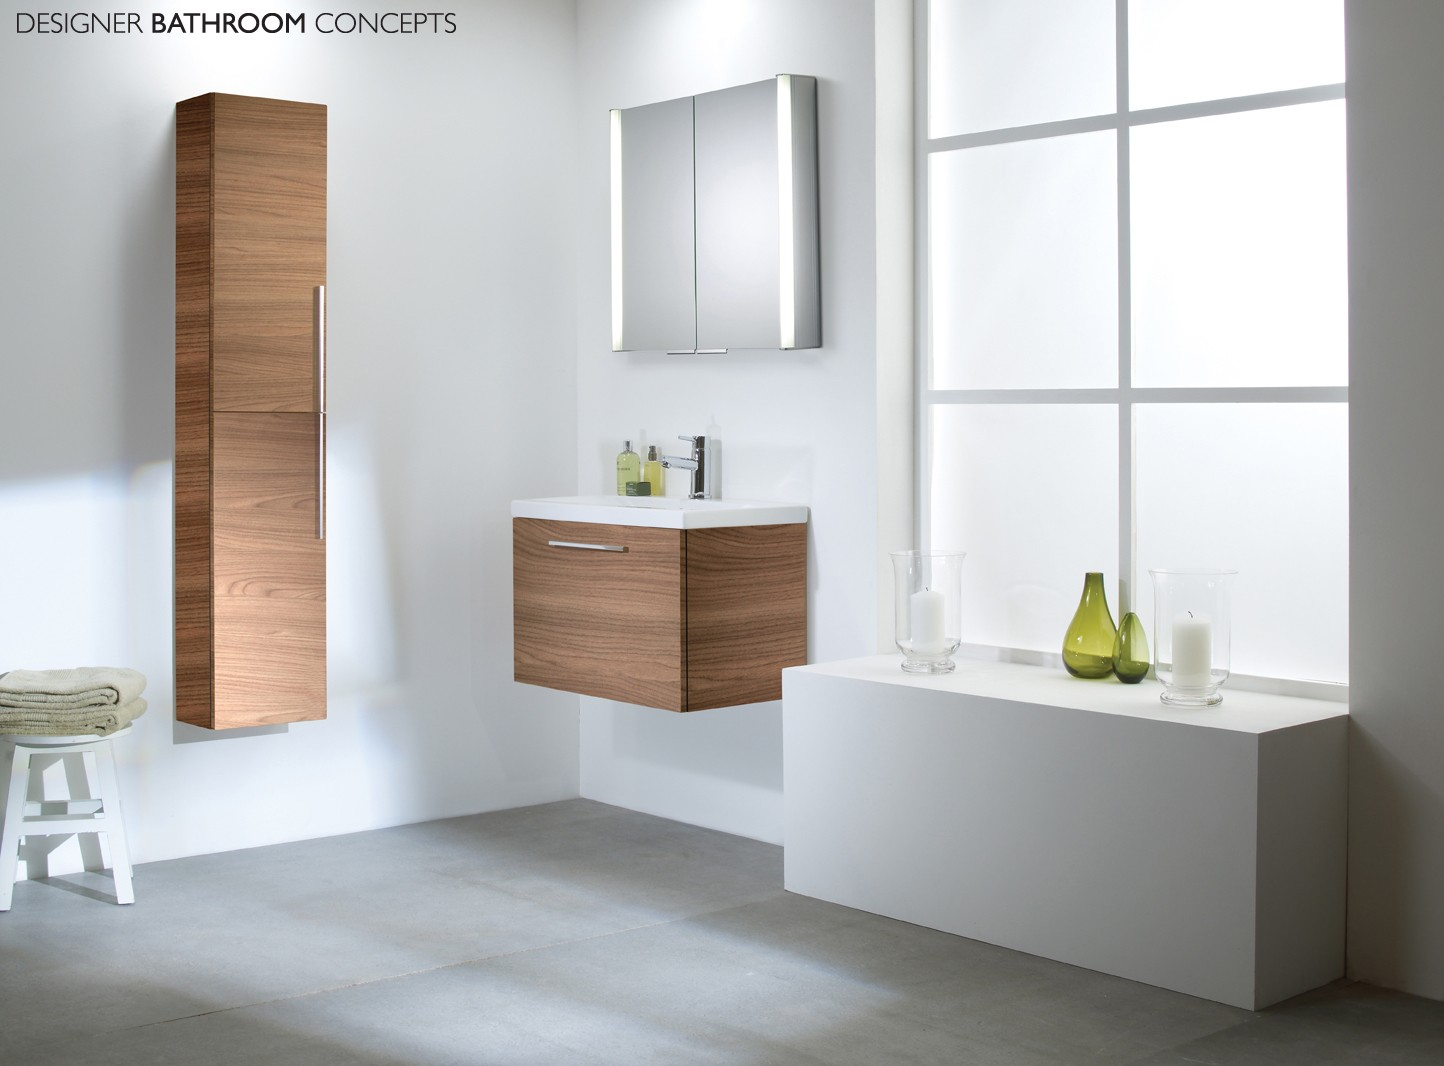 spa bathroom furniture photo - 5